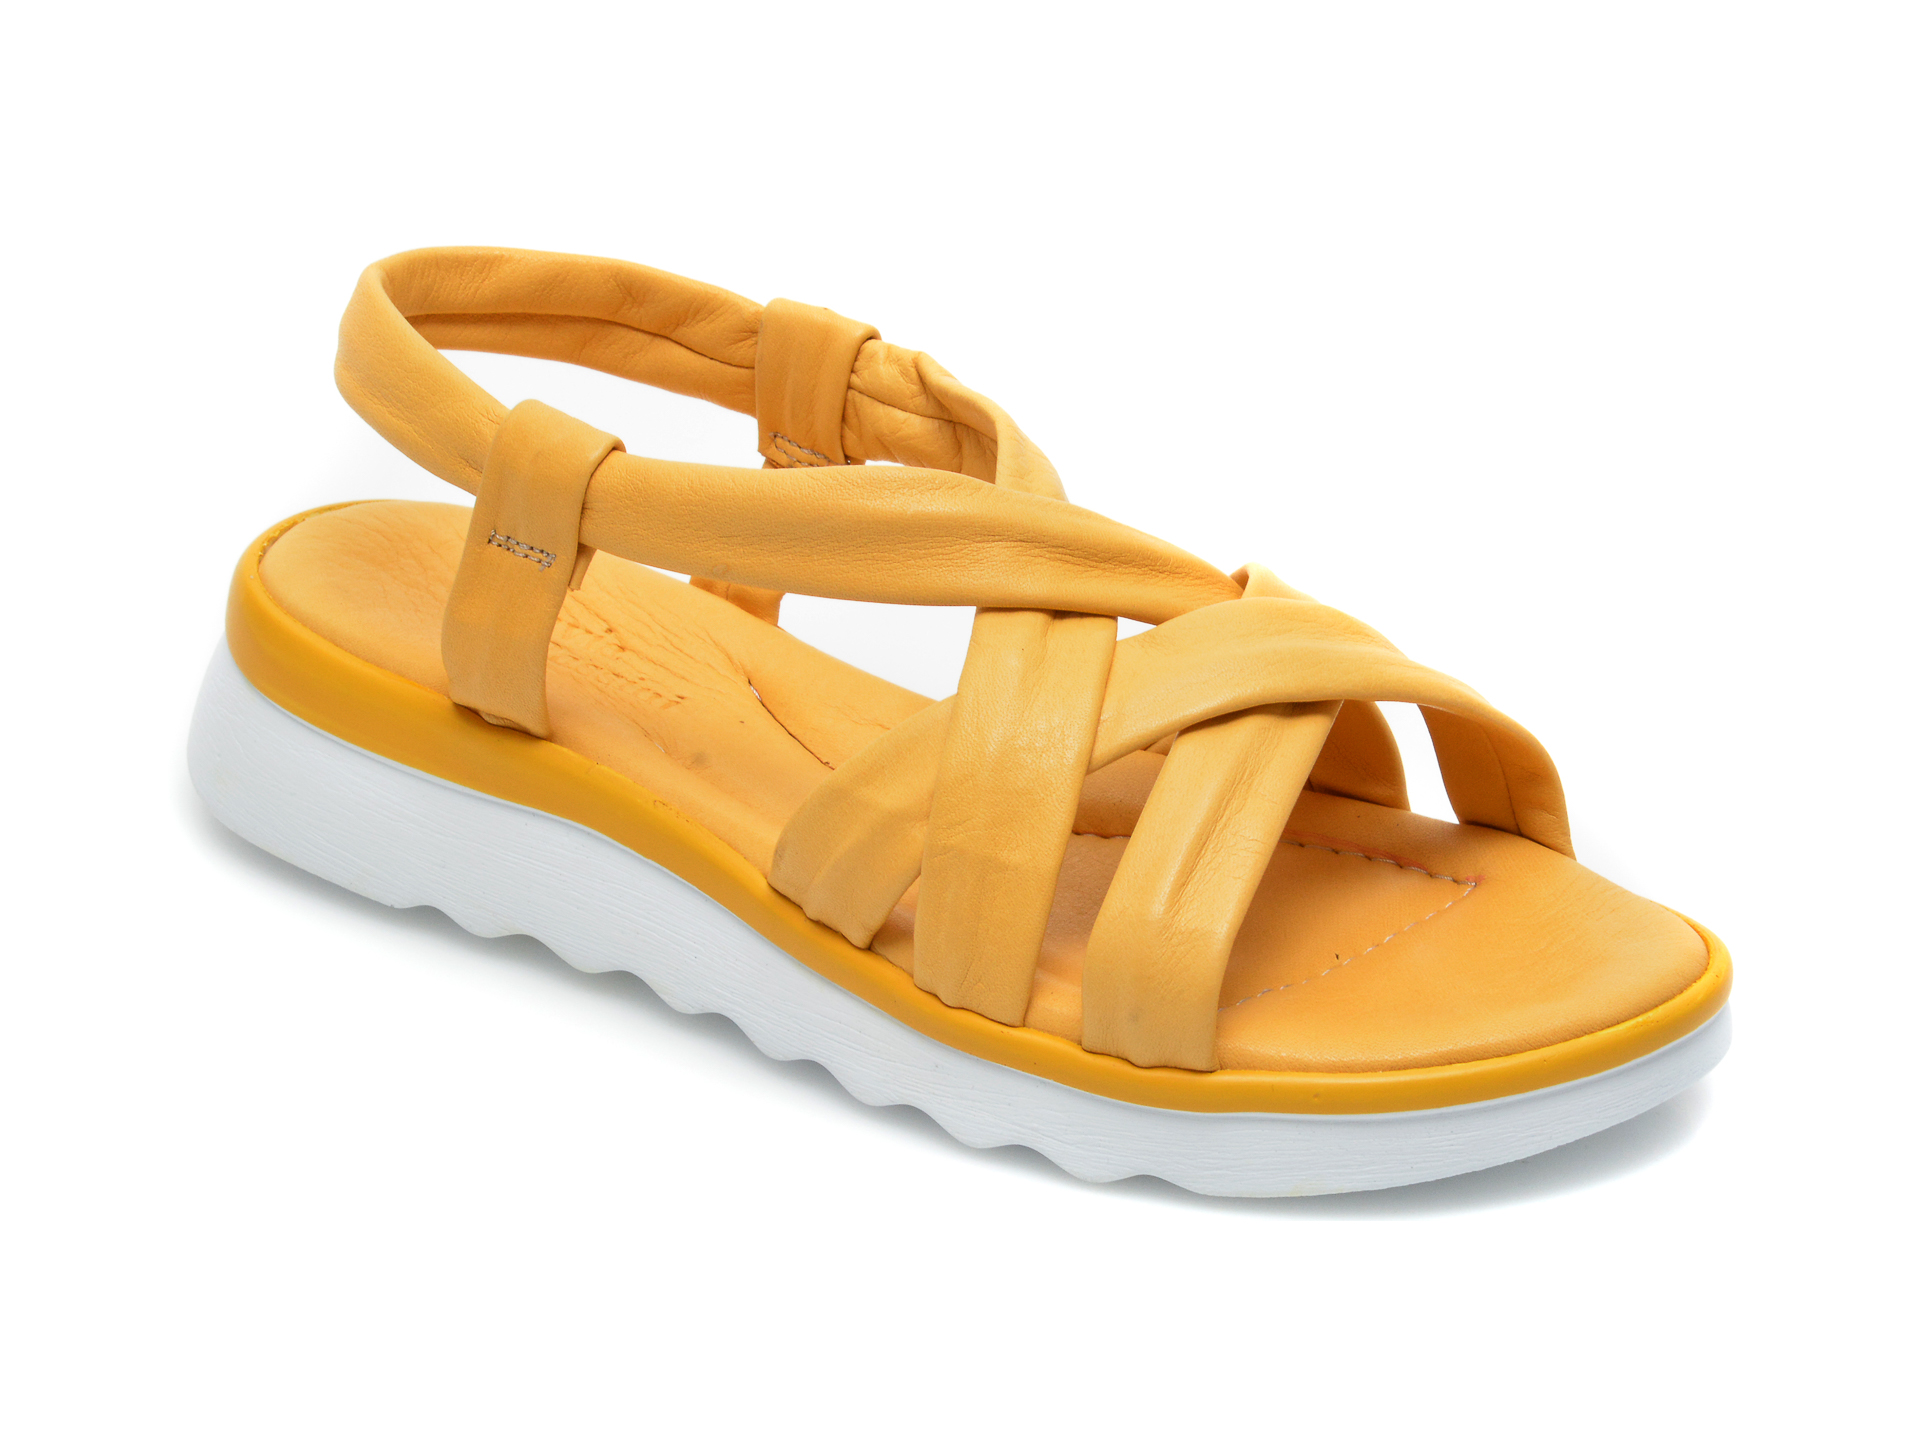 Sandale FLAVIA PASSINI galbene, EI24500, din piele naturala